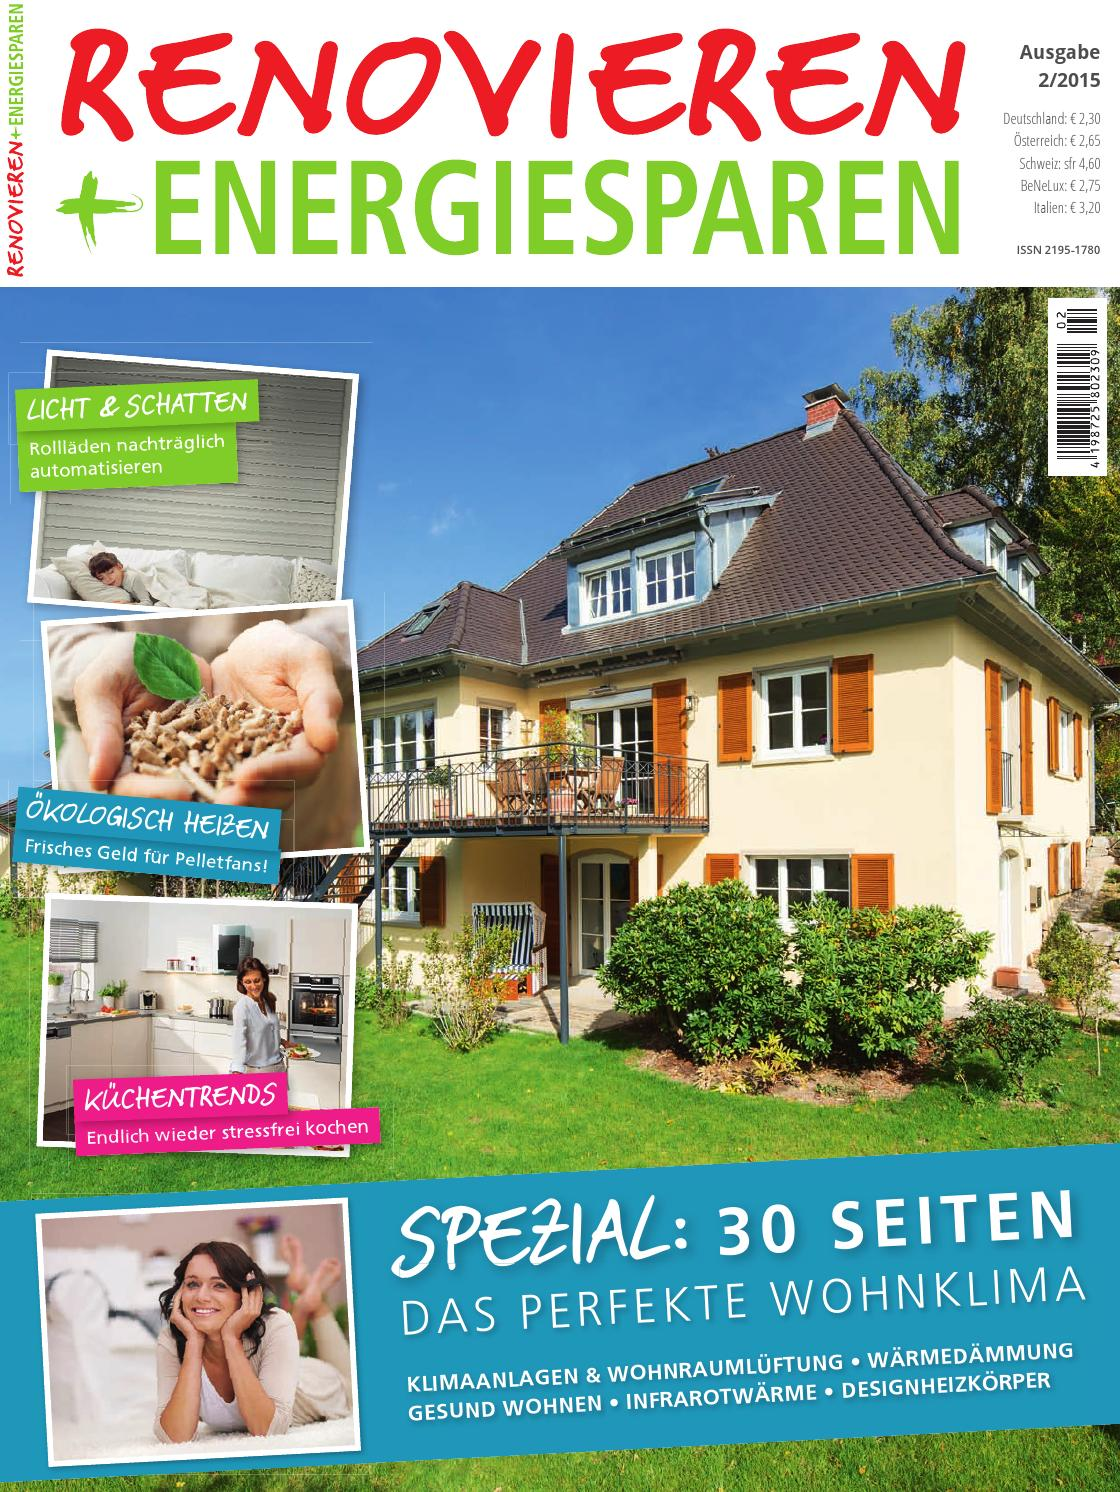 Renovieren & Energiesparen 2/2015 by Family Home Verlag GmbH - issuu